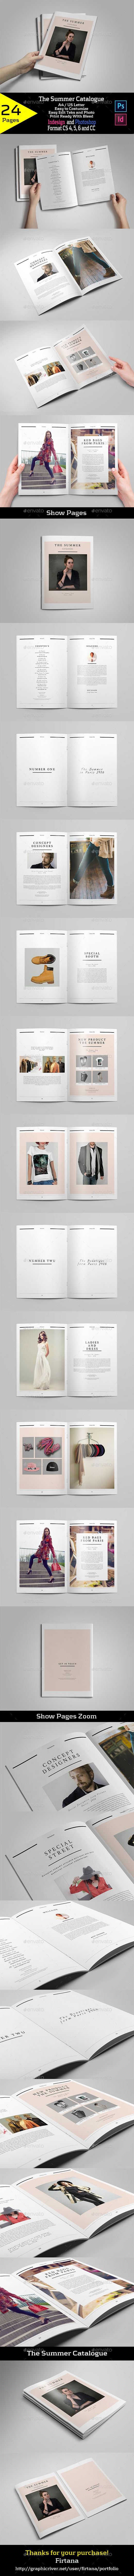 The Summer Catalogue - Brochures Print Templates